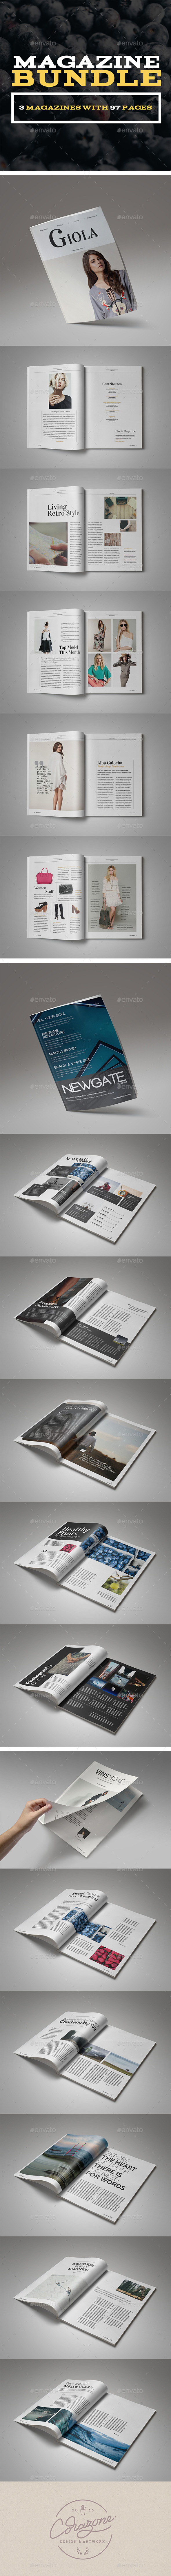 Magazine Bundle Vol.2 - Magazines Print Templates